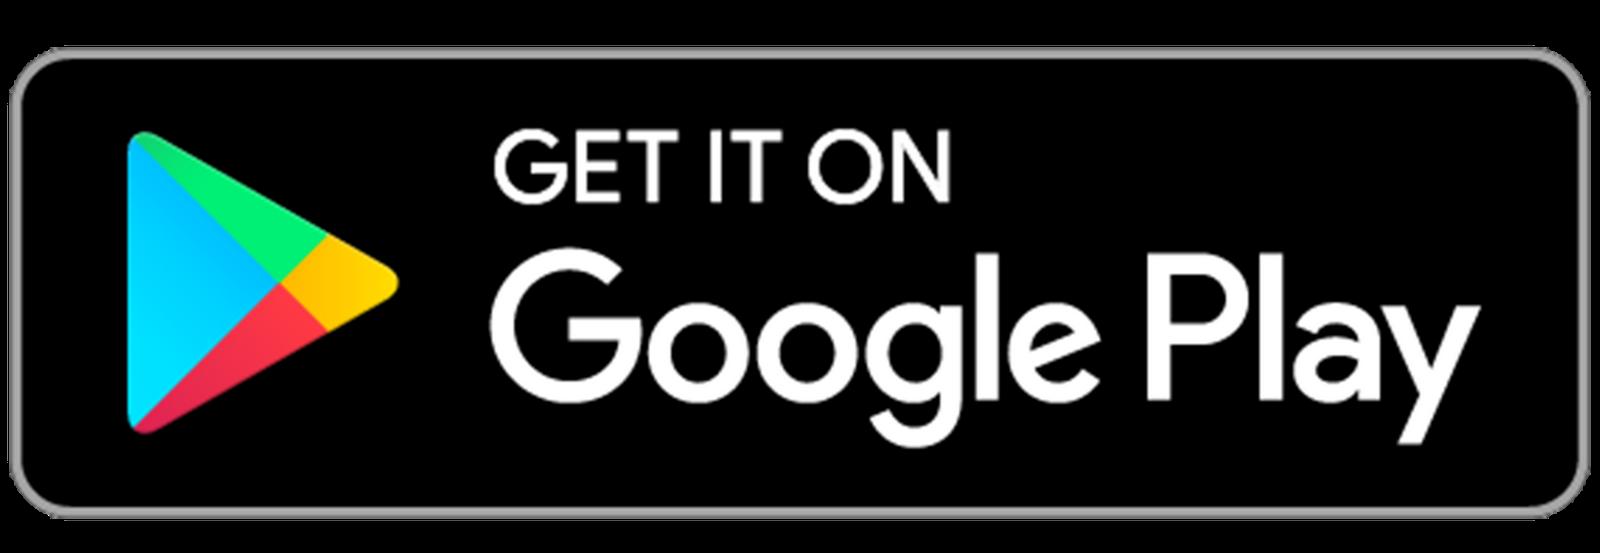 Uber Google Play Download